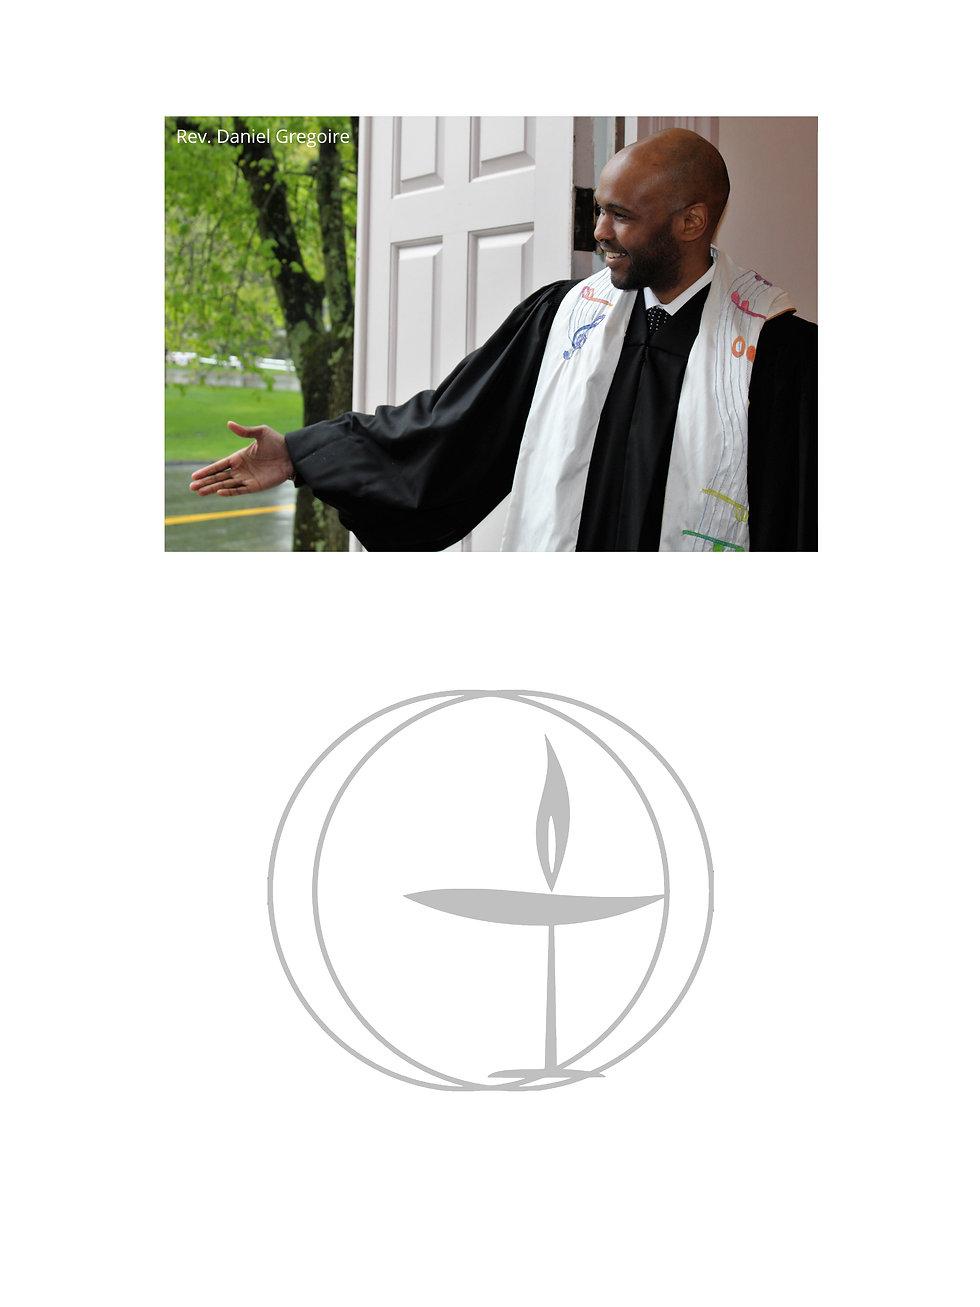 Daniel doorway Strip Background Image 3Kx4K.jpg